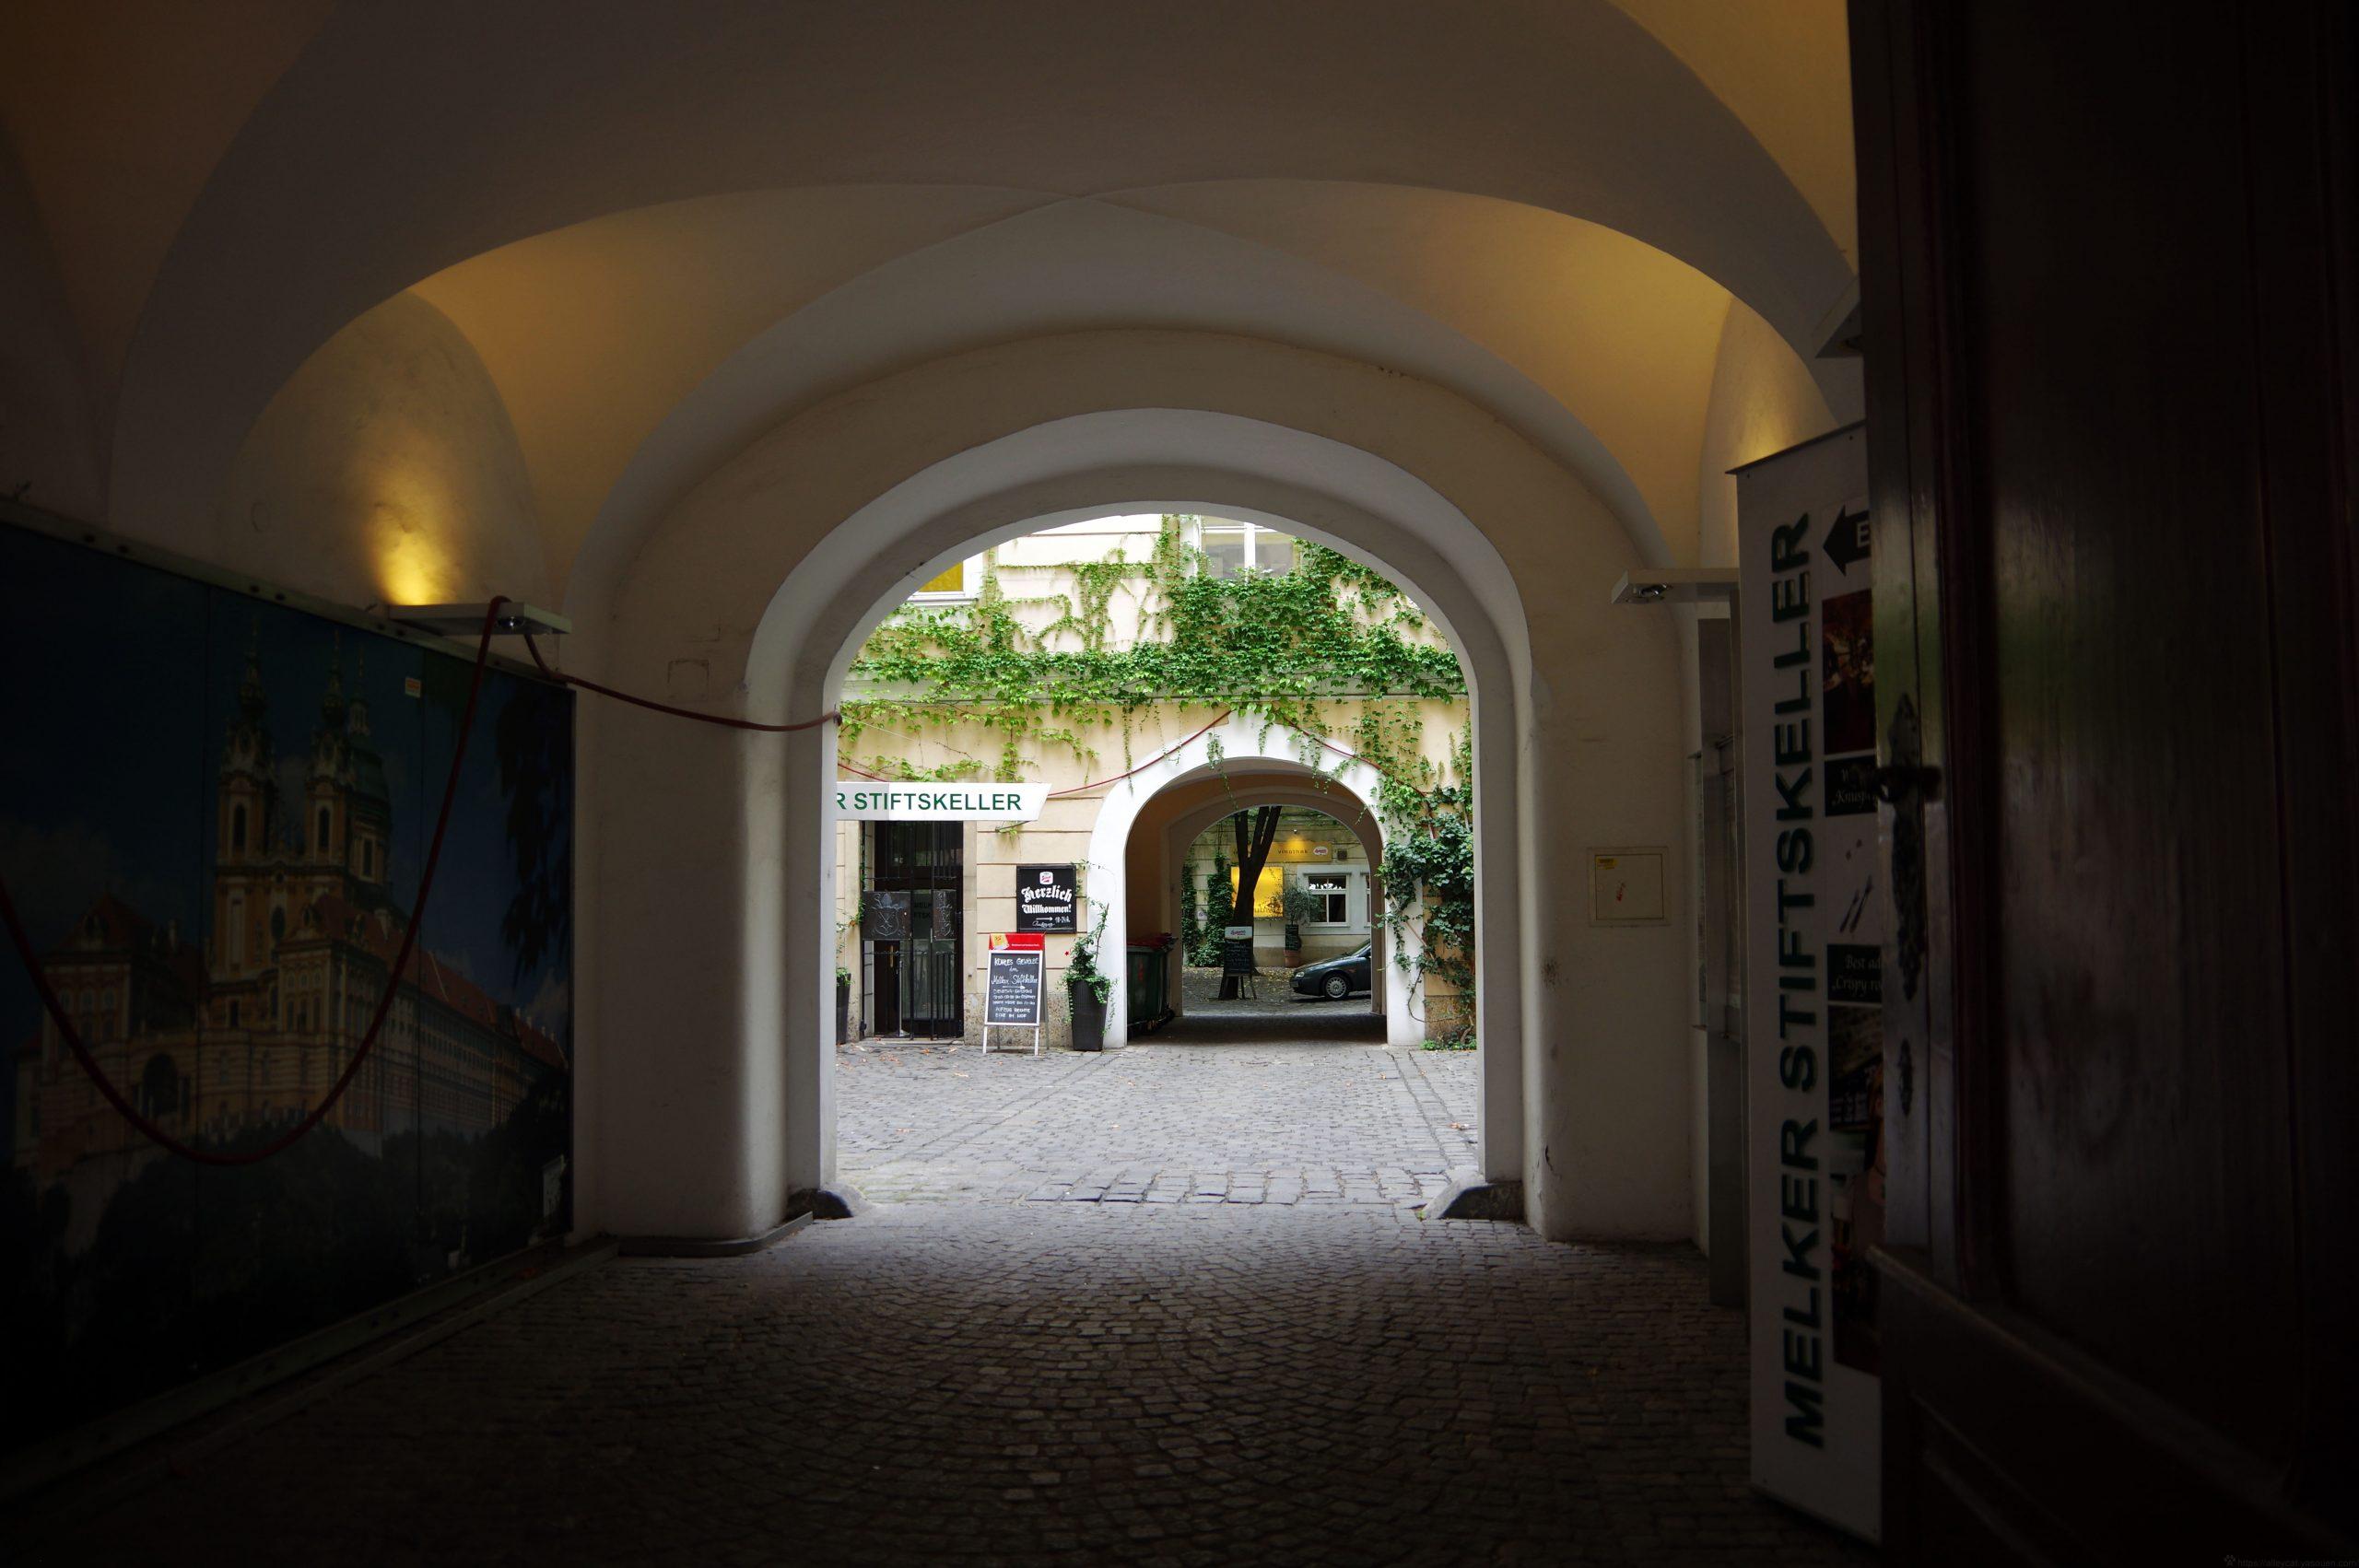 Vienna, Austria, 2016